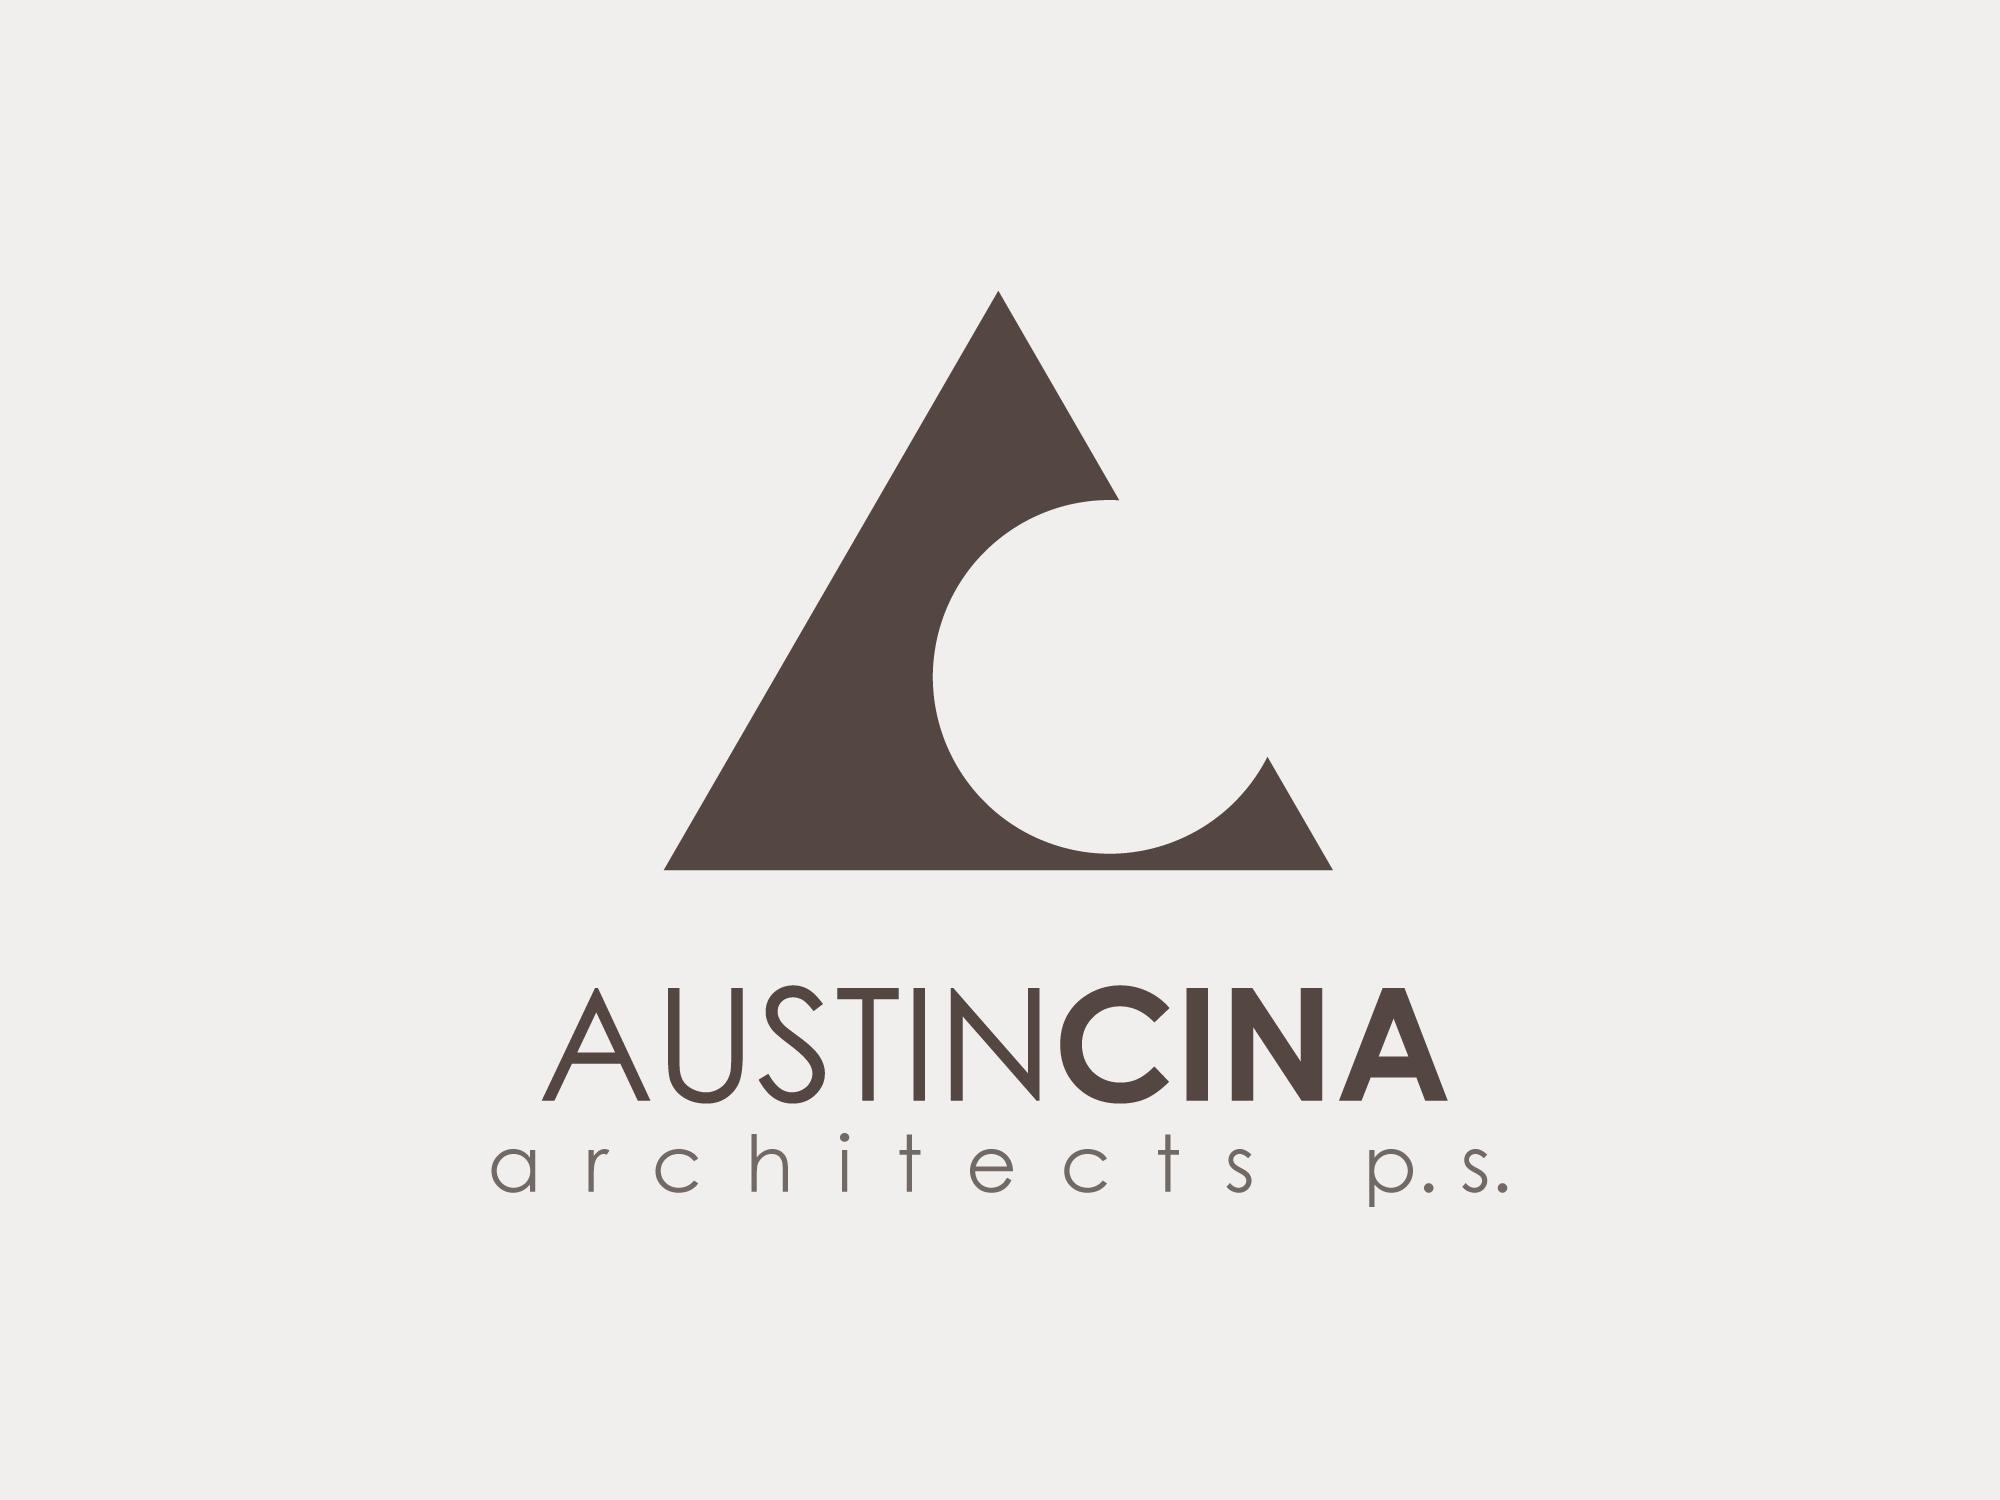 AustinCina-Web-Logos-placeholder